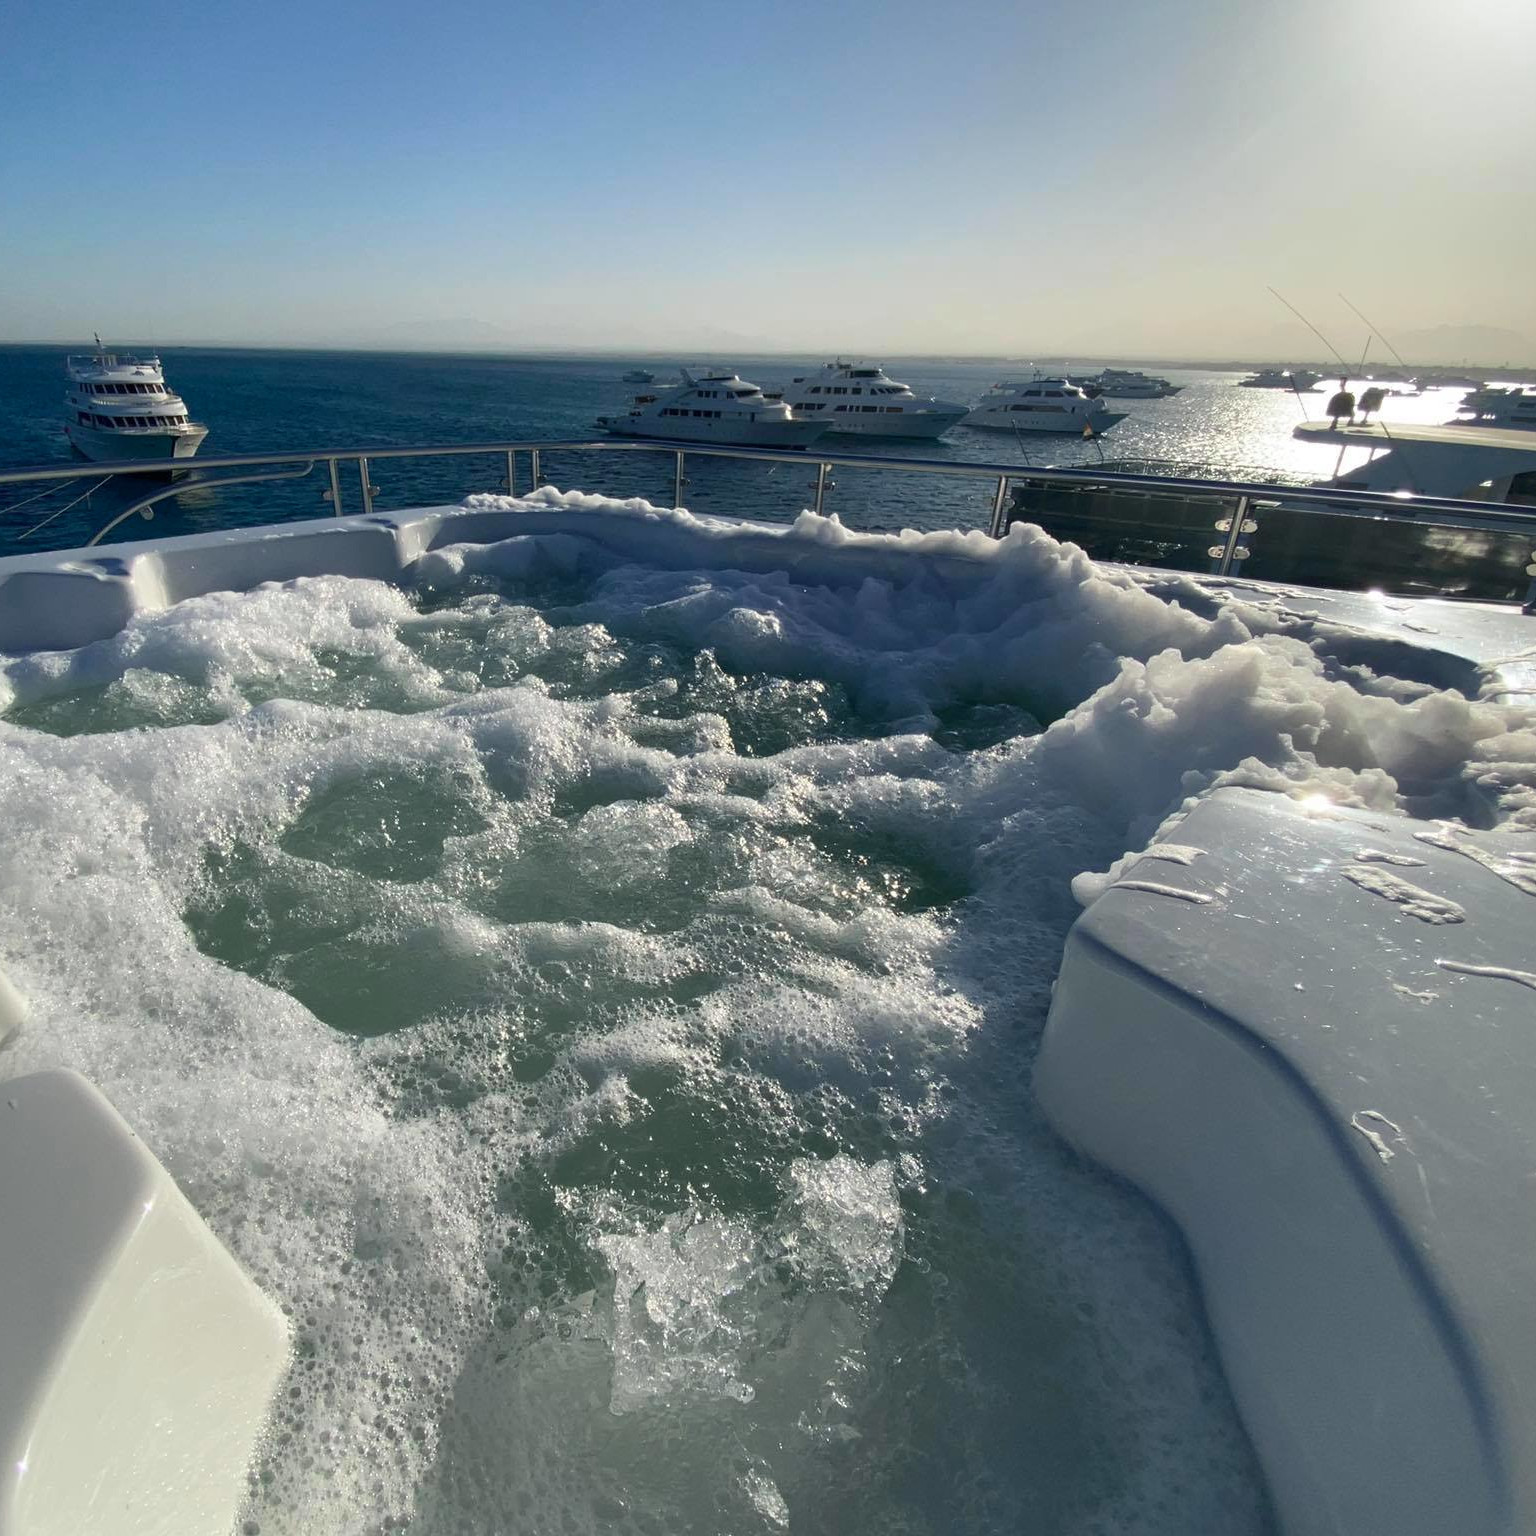 kitetrip mar rojo barco